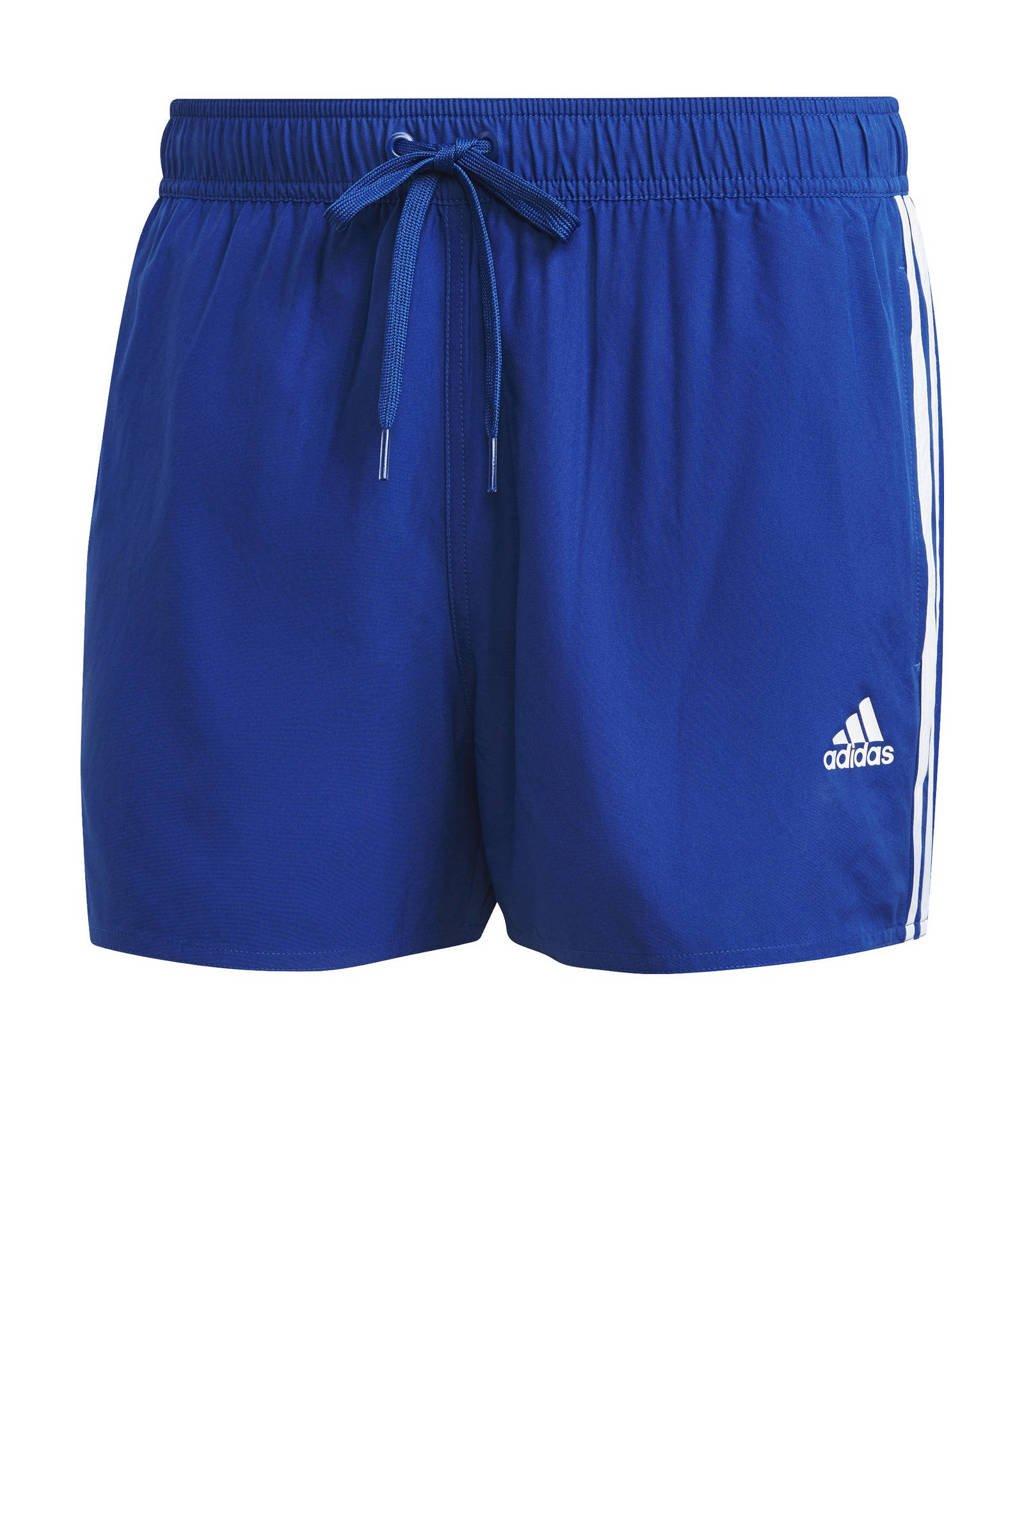 Adidas Classic zwemshort heren blauw